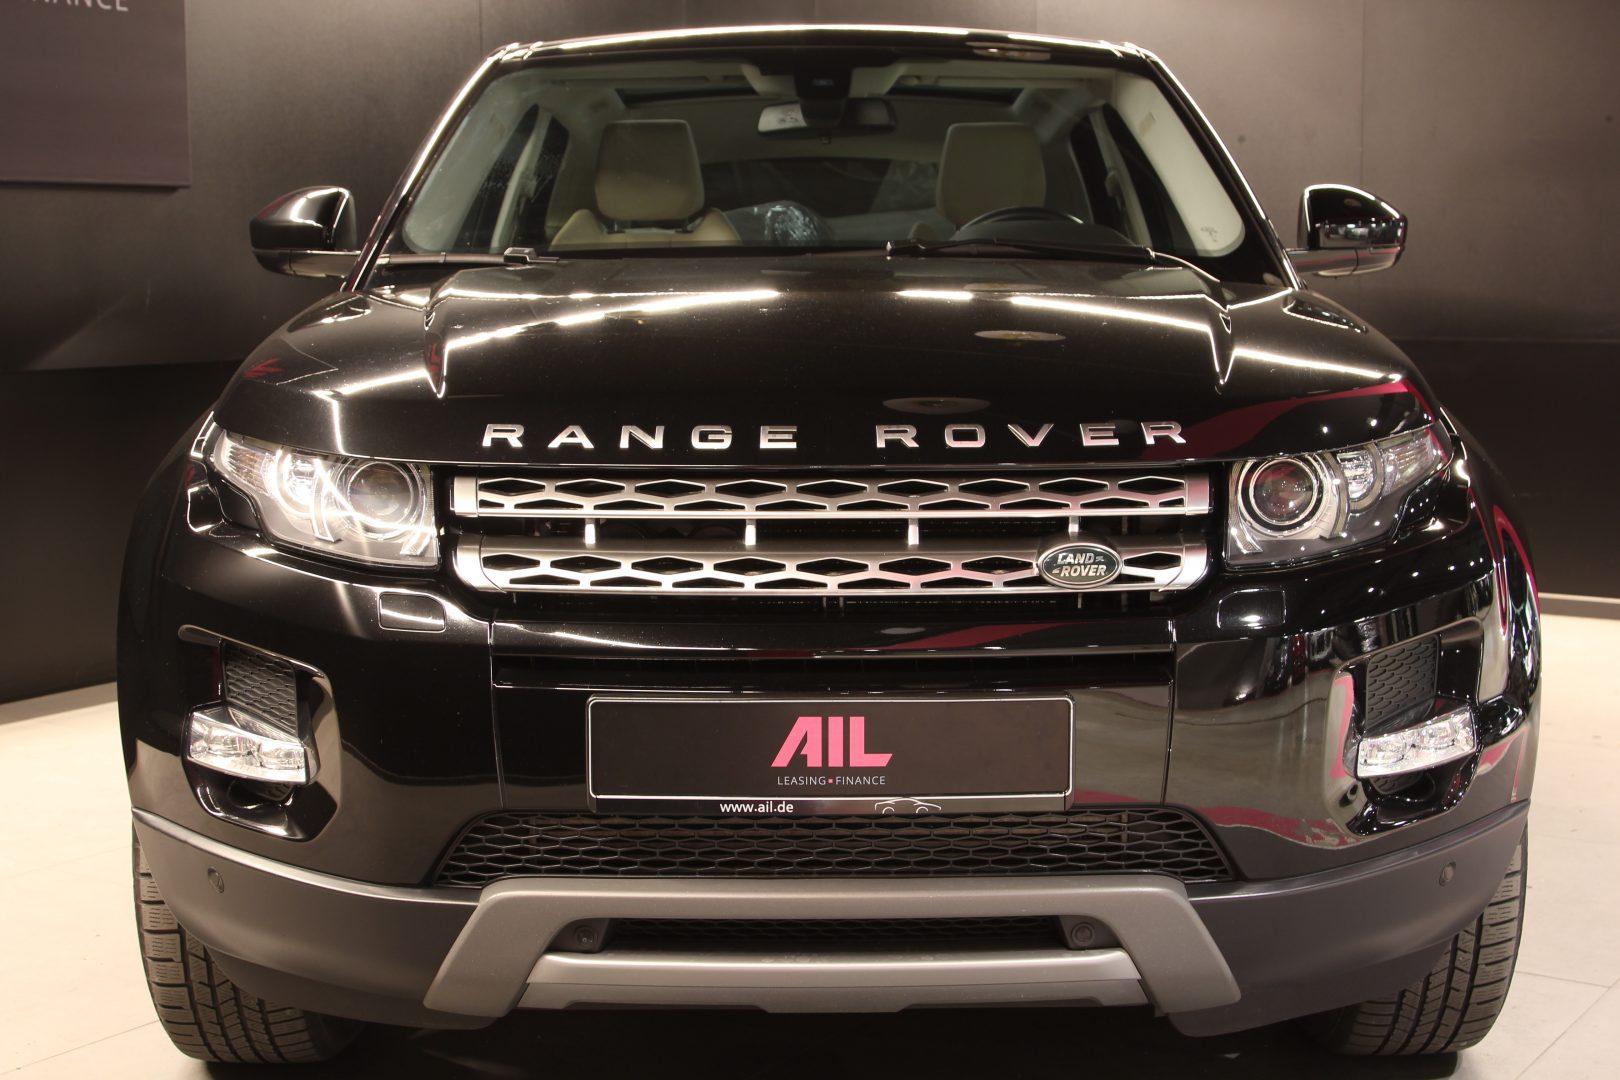 AIL Land Rover Range Rover Evoque Prestige 10